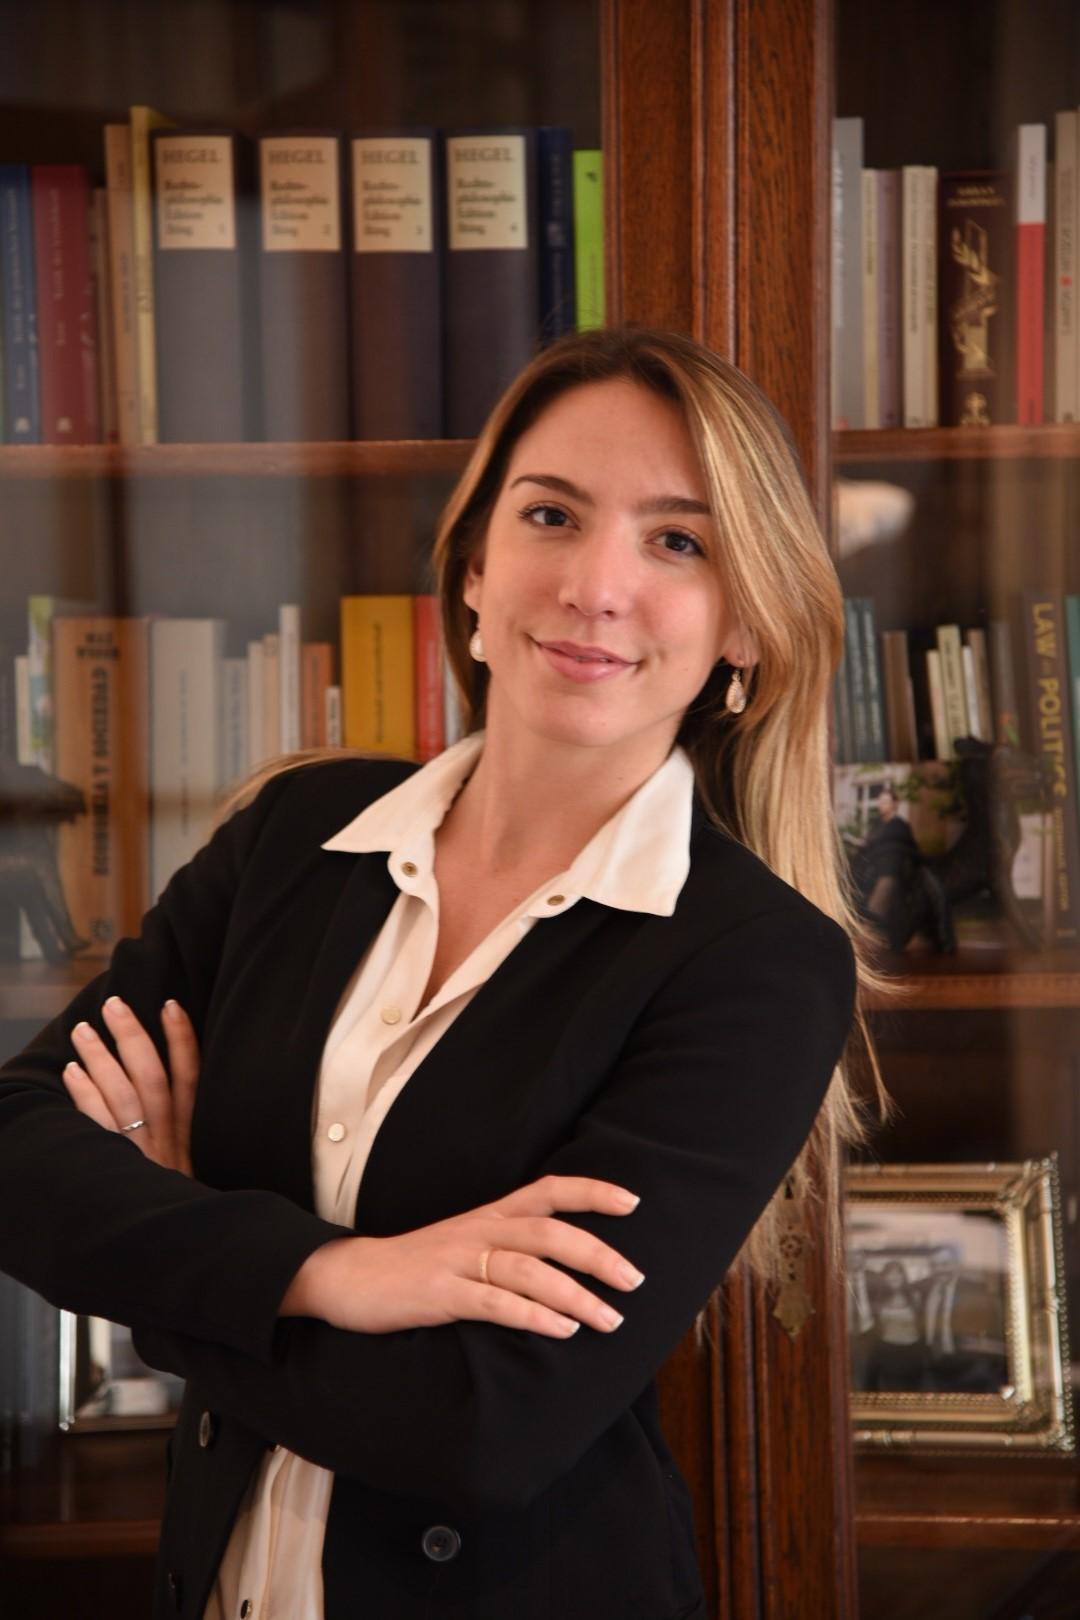 Lucía Barreto